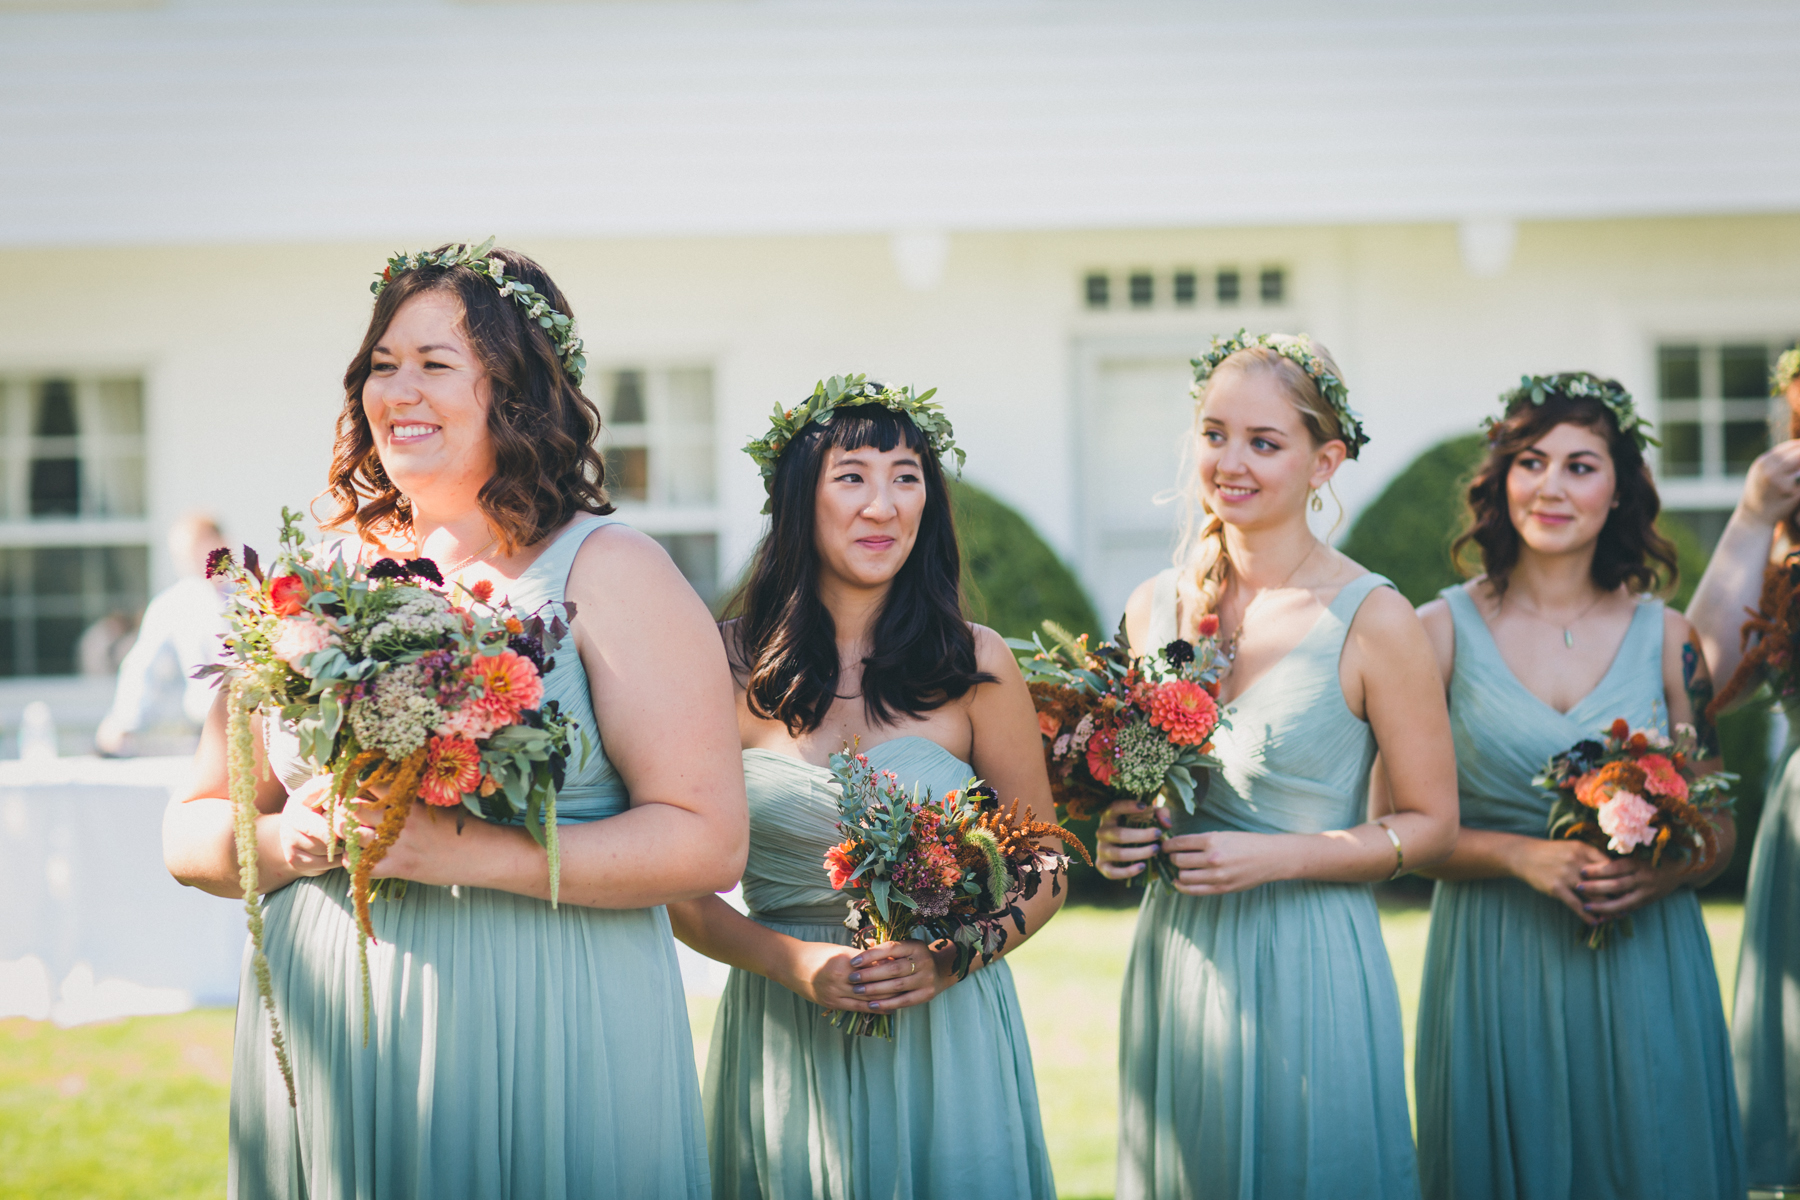 Long-Island-Documentary-Wedding-Photography-Summer-Tent-Wedding-in-New-York-69.jpg